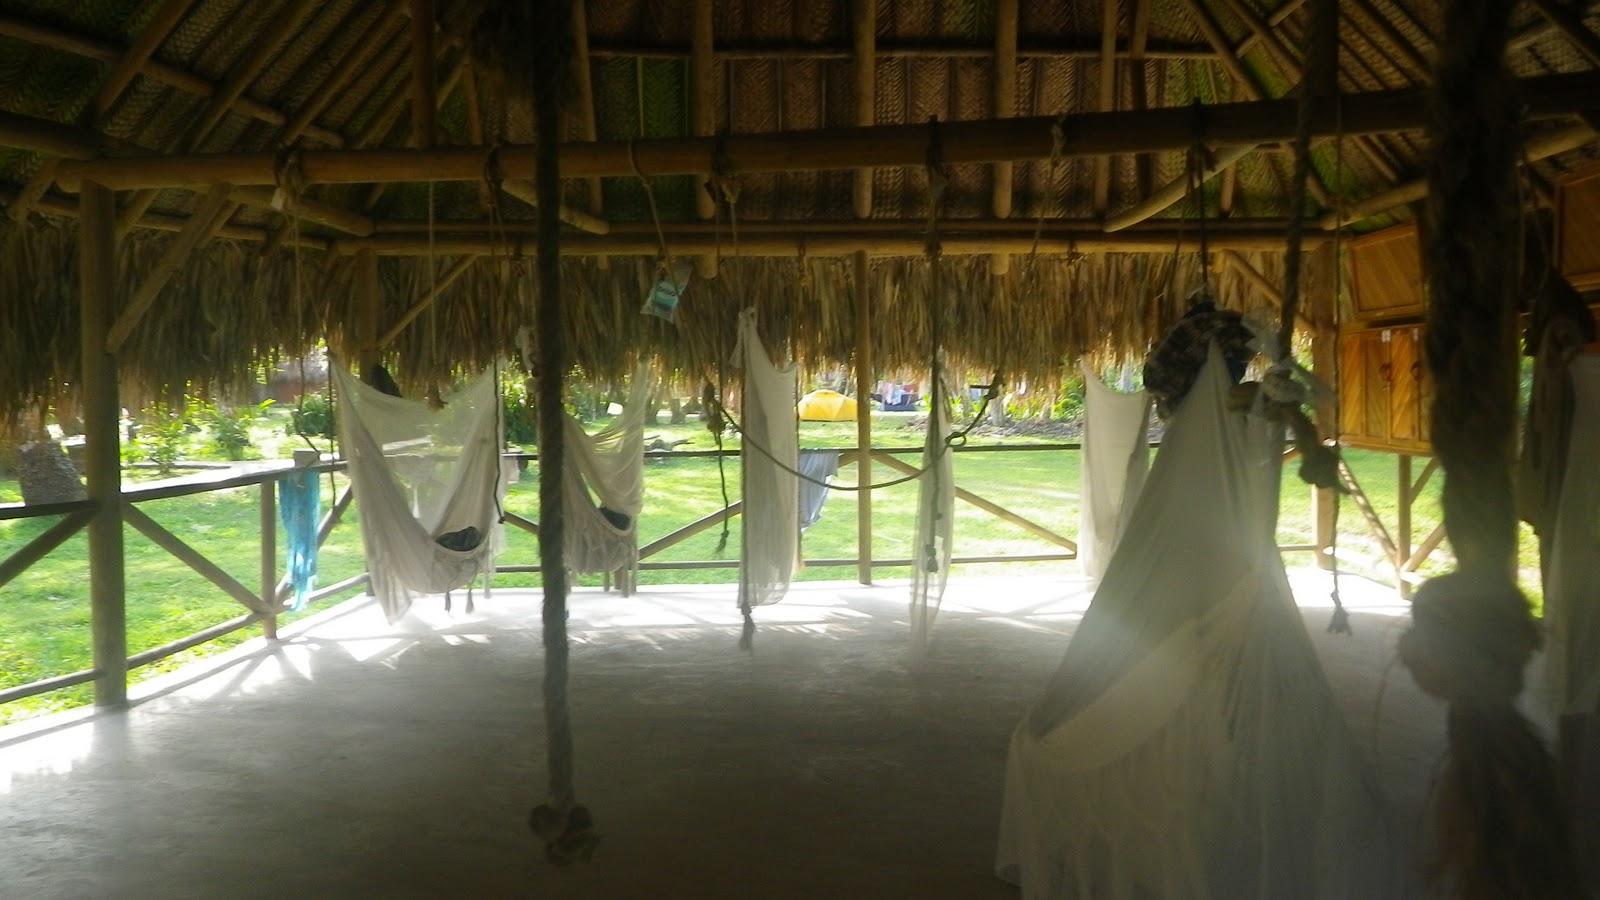 One accommodation option at Tayrona: Hammocks